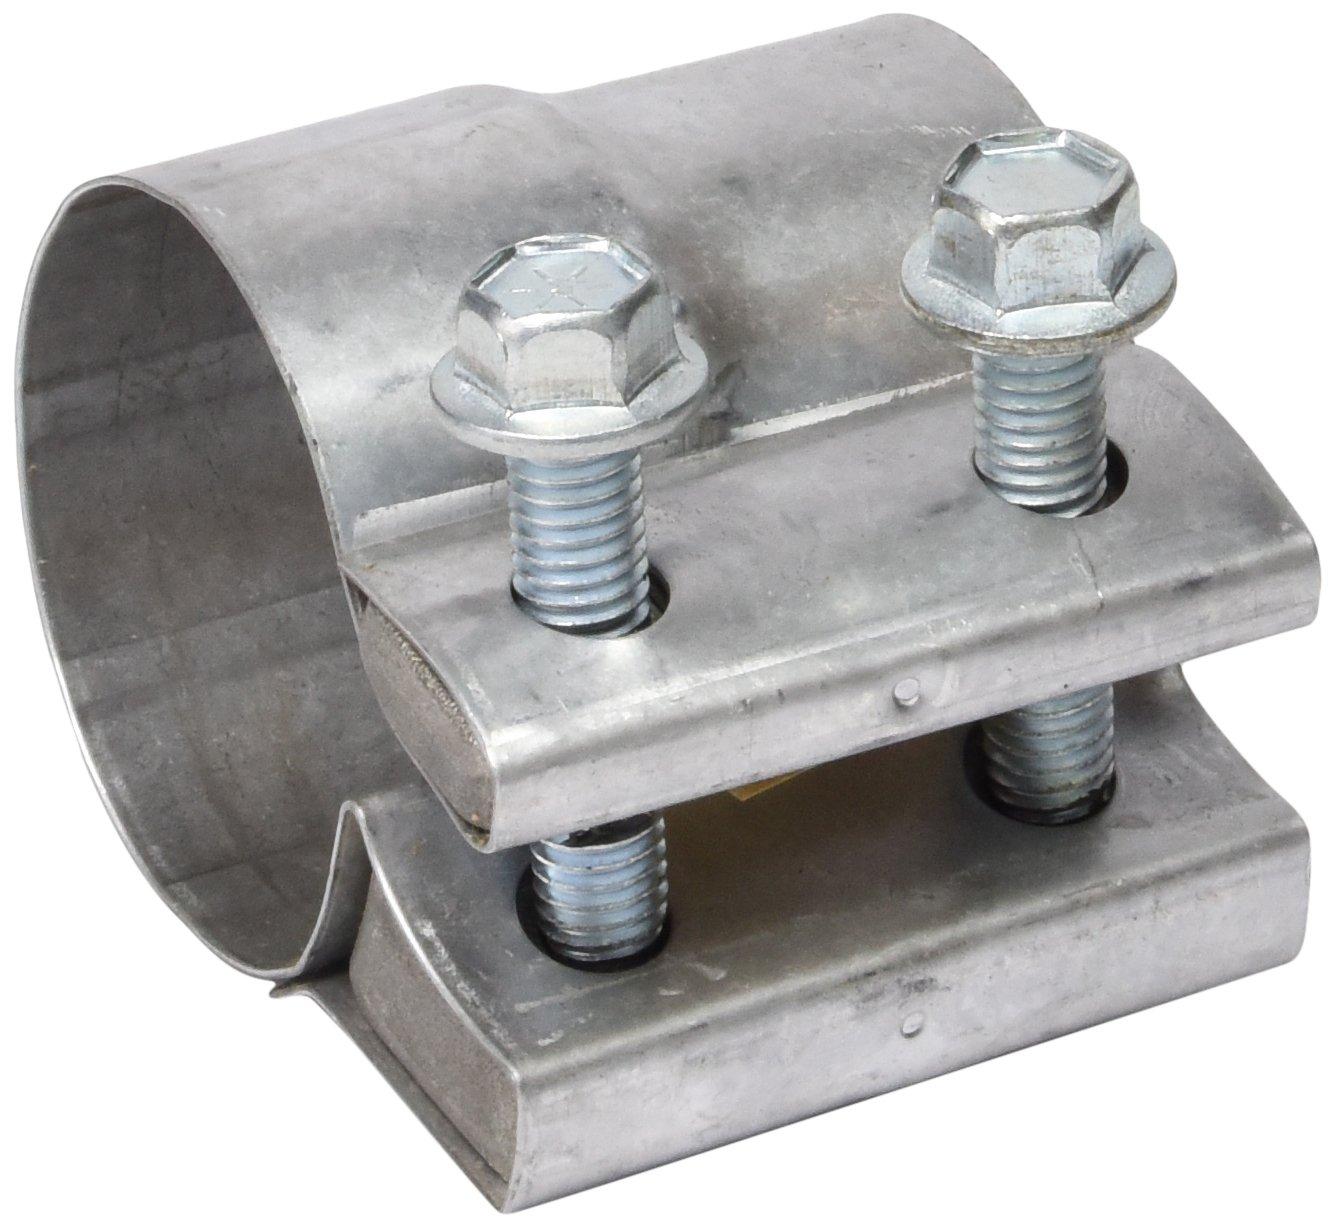 33287 4-1//2 Aluminized Lap-Joint Exhaust Clamp Walker